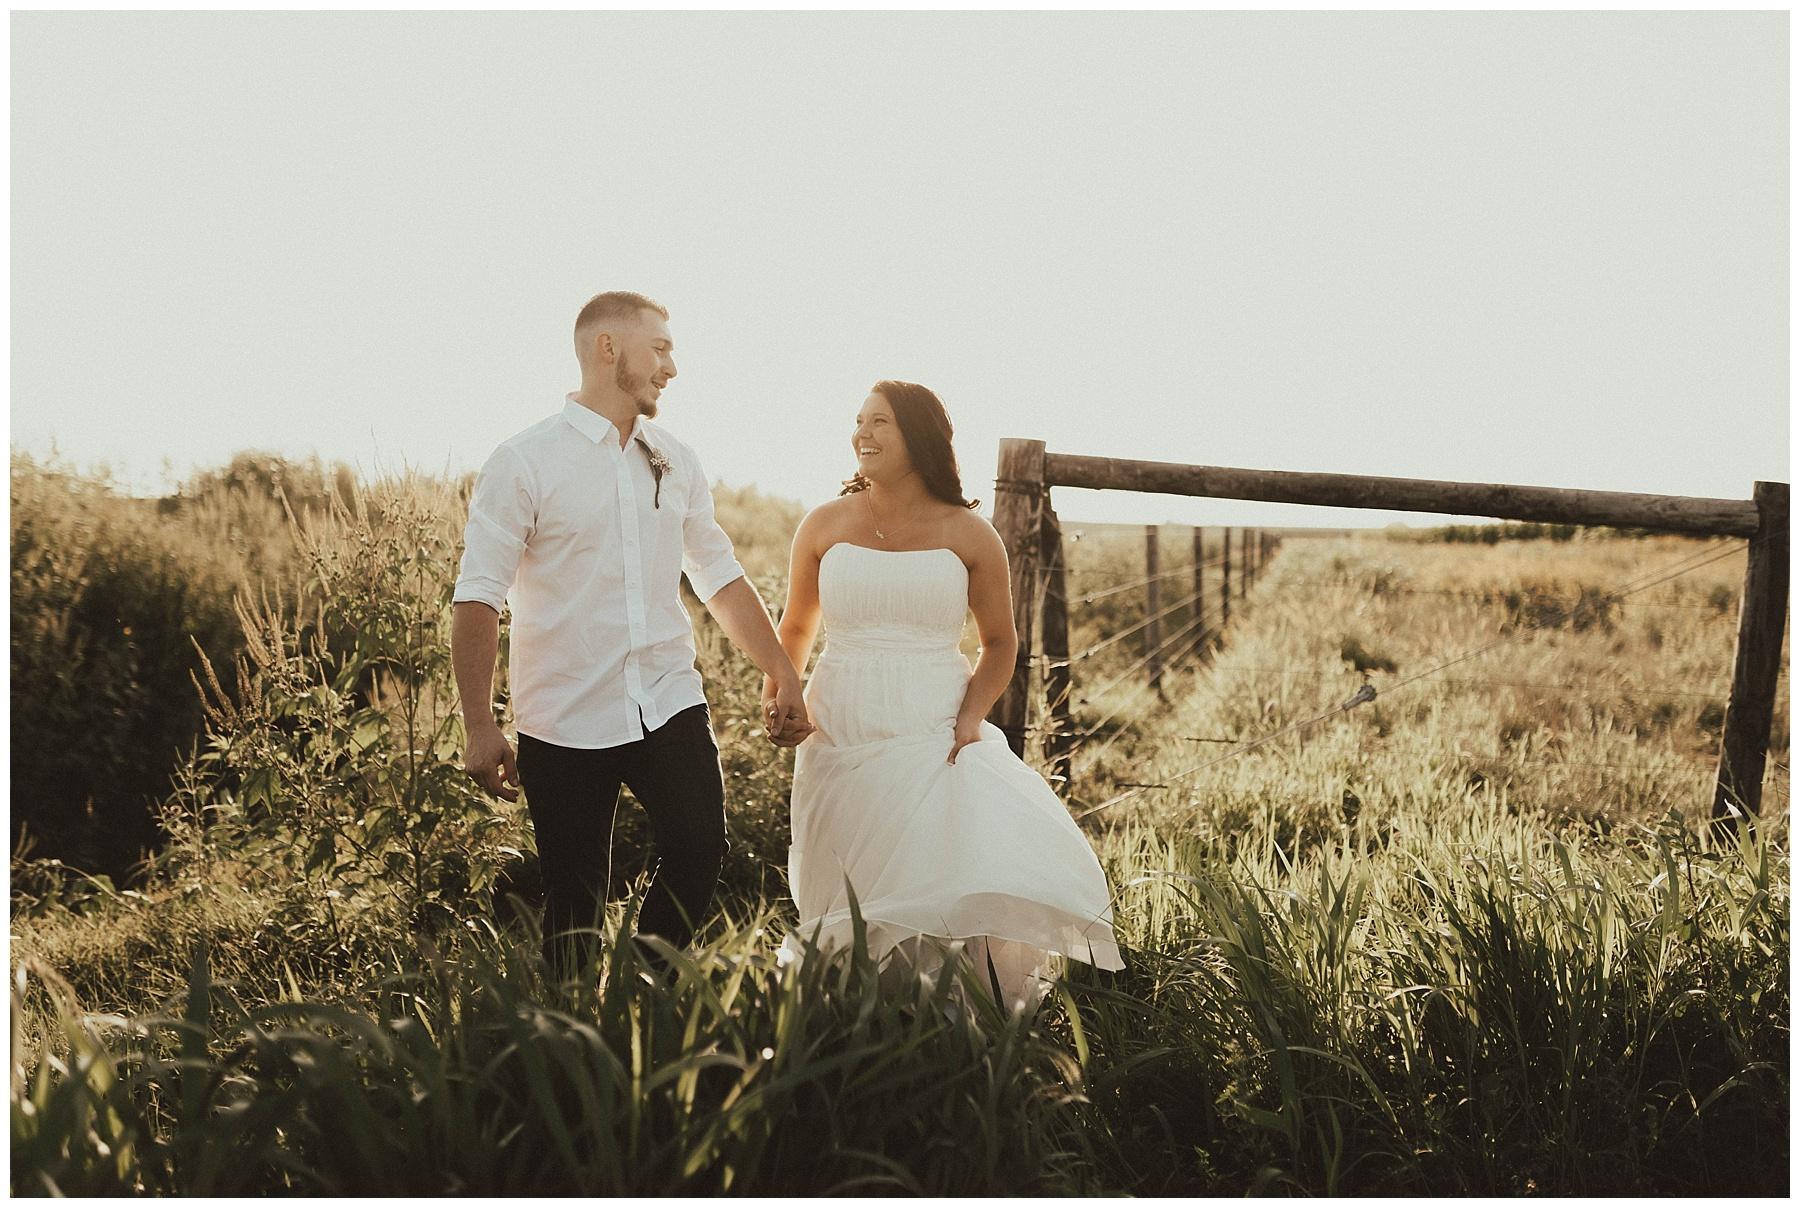 9279d592ab Devan + Molly    Midwest Bridals - Lauren F.otography